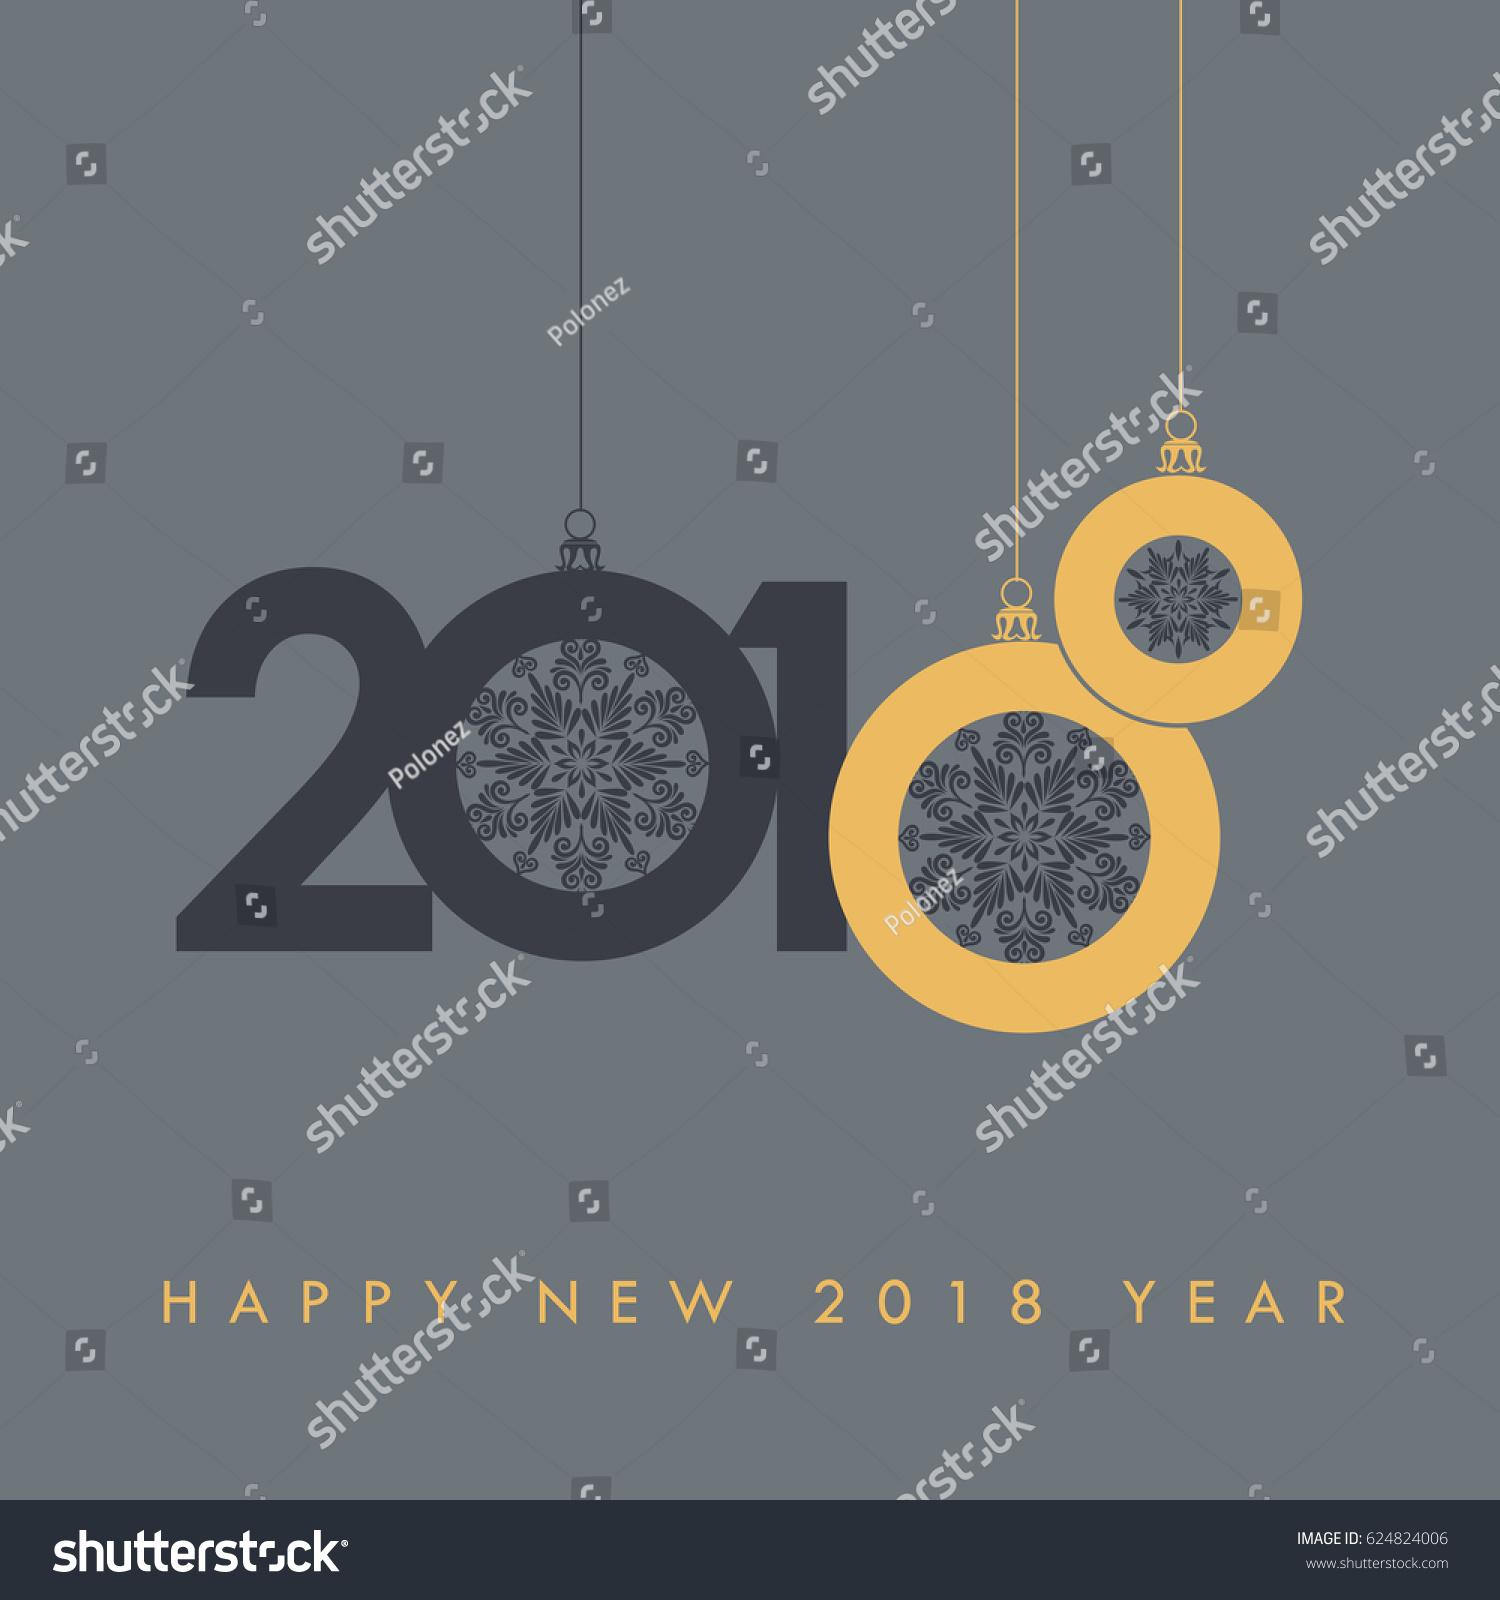 Happy New 2018 Year Holidays Seasons Stock Vector Royalty Free